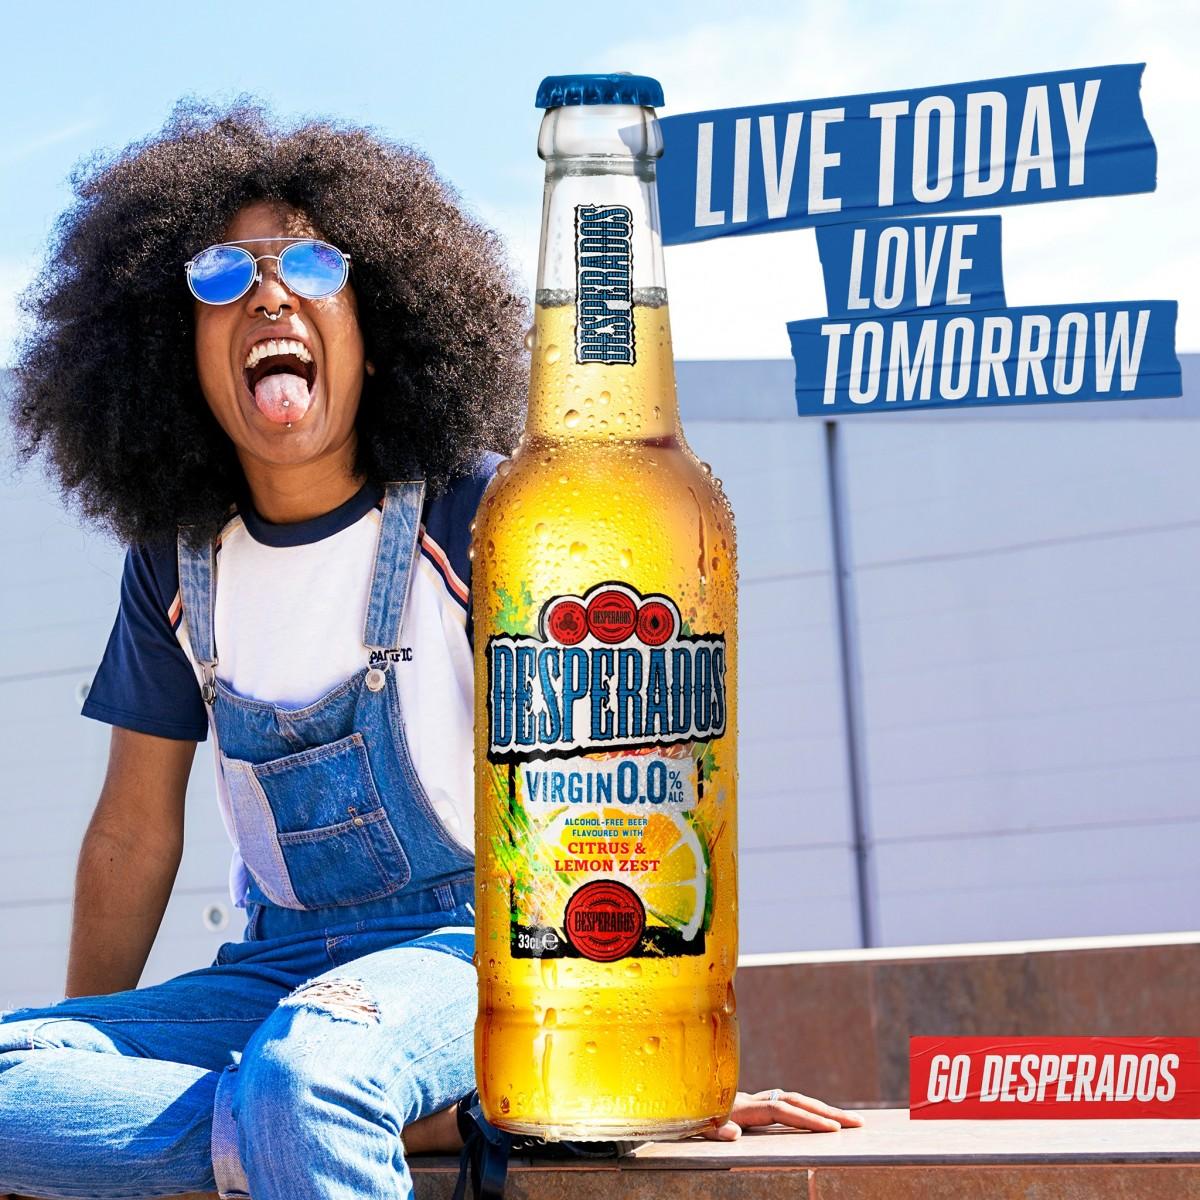 Desperados Launches Alcohol-Free Innovation, Desperados Virgin 0.0% Brandspurng1